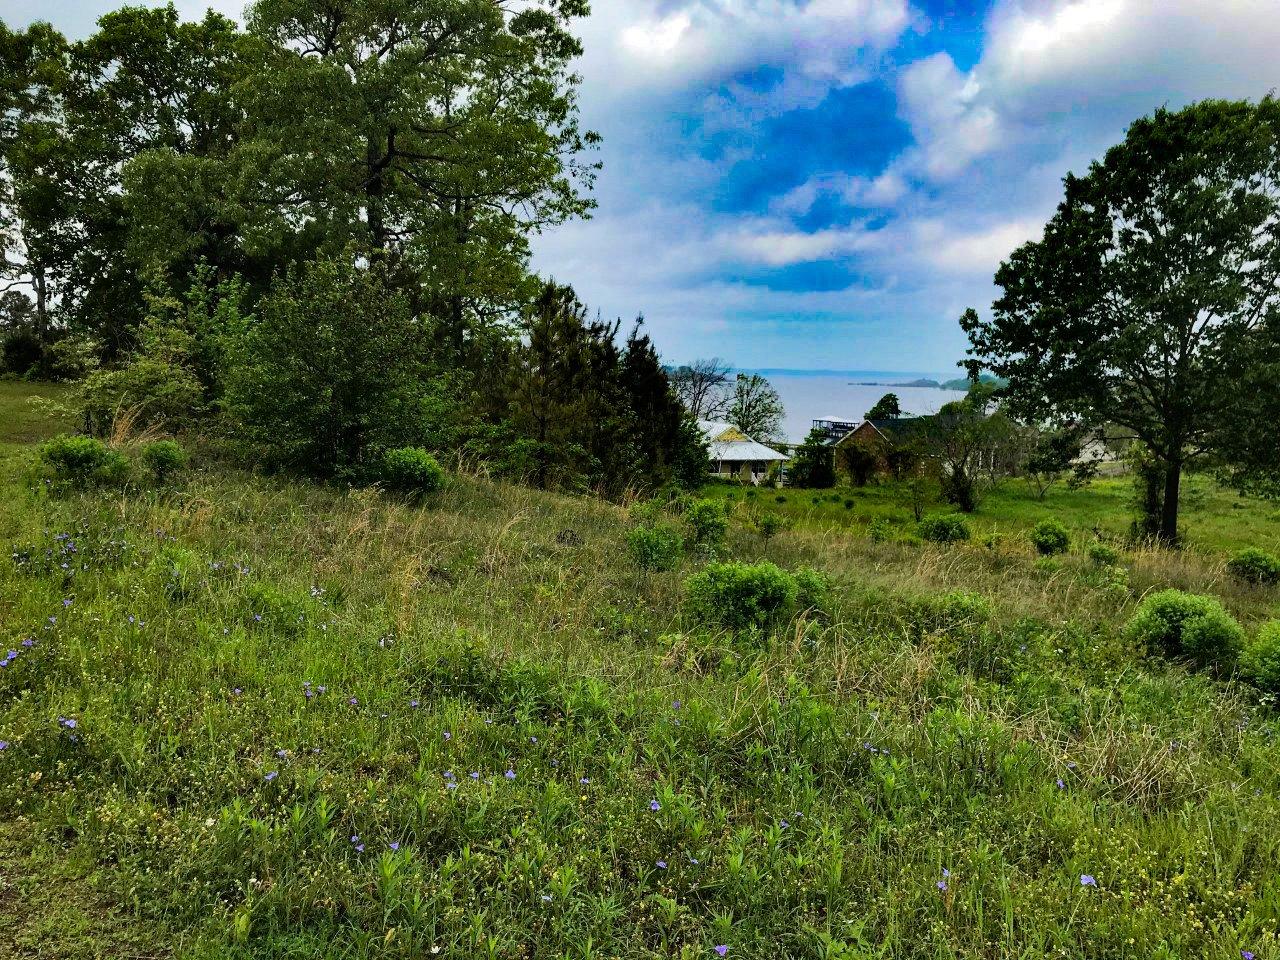 Lot 21 of Toledo Bend Lakeside Estates (Water View)